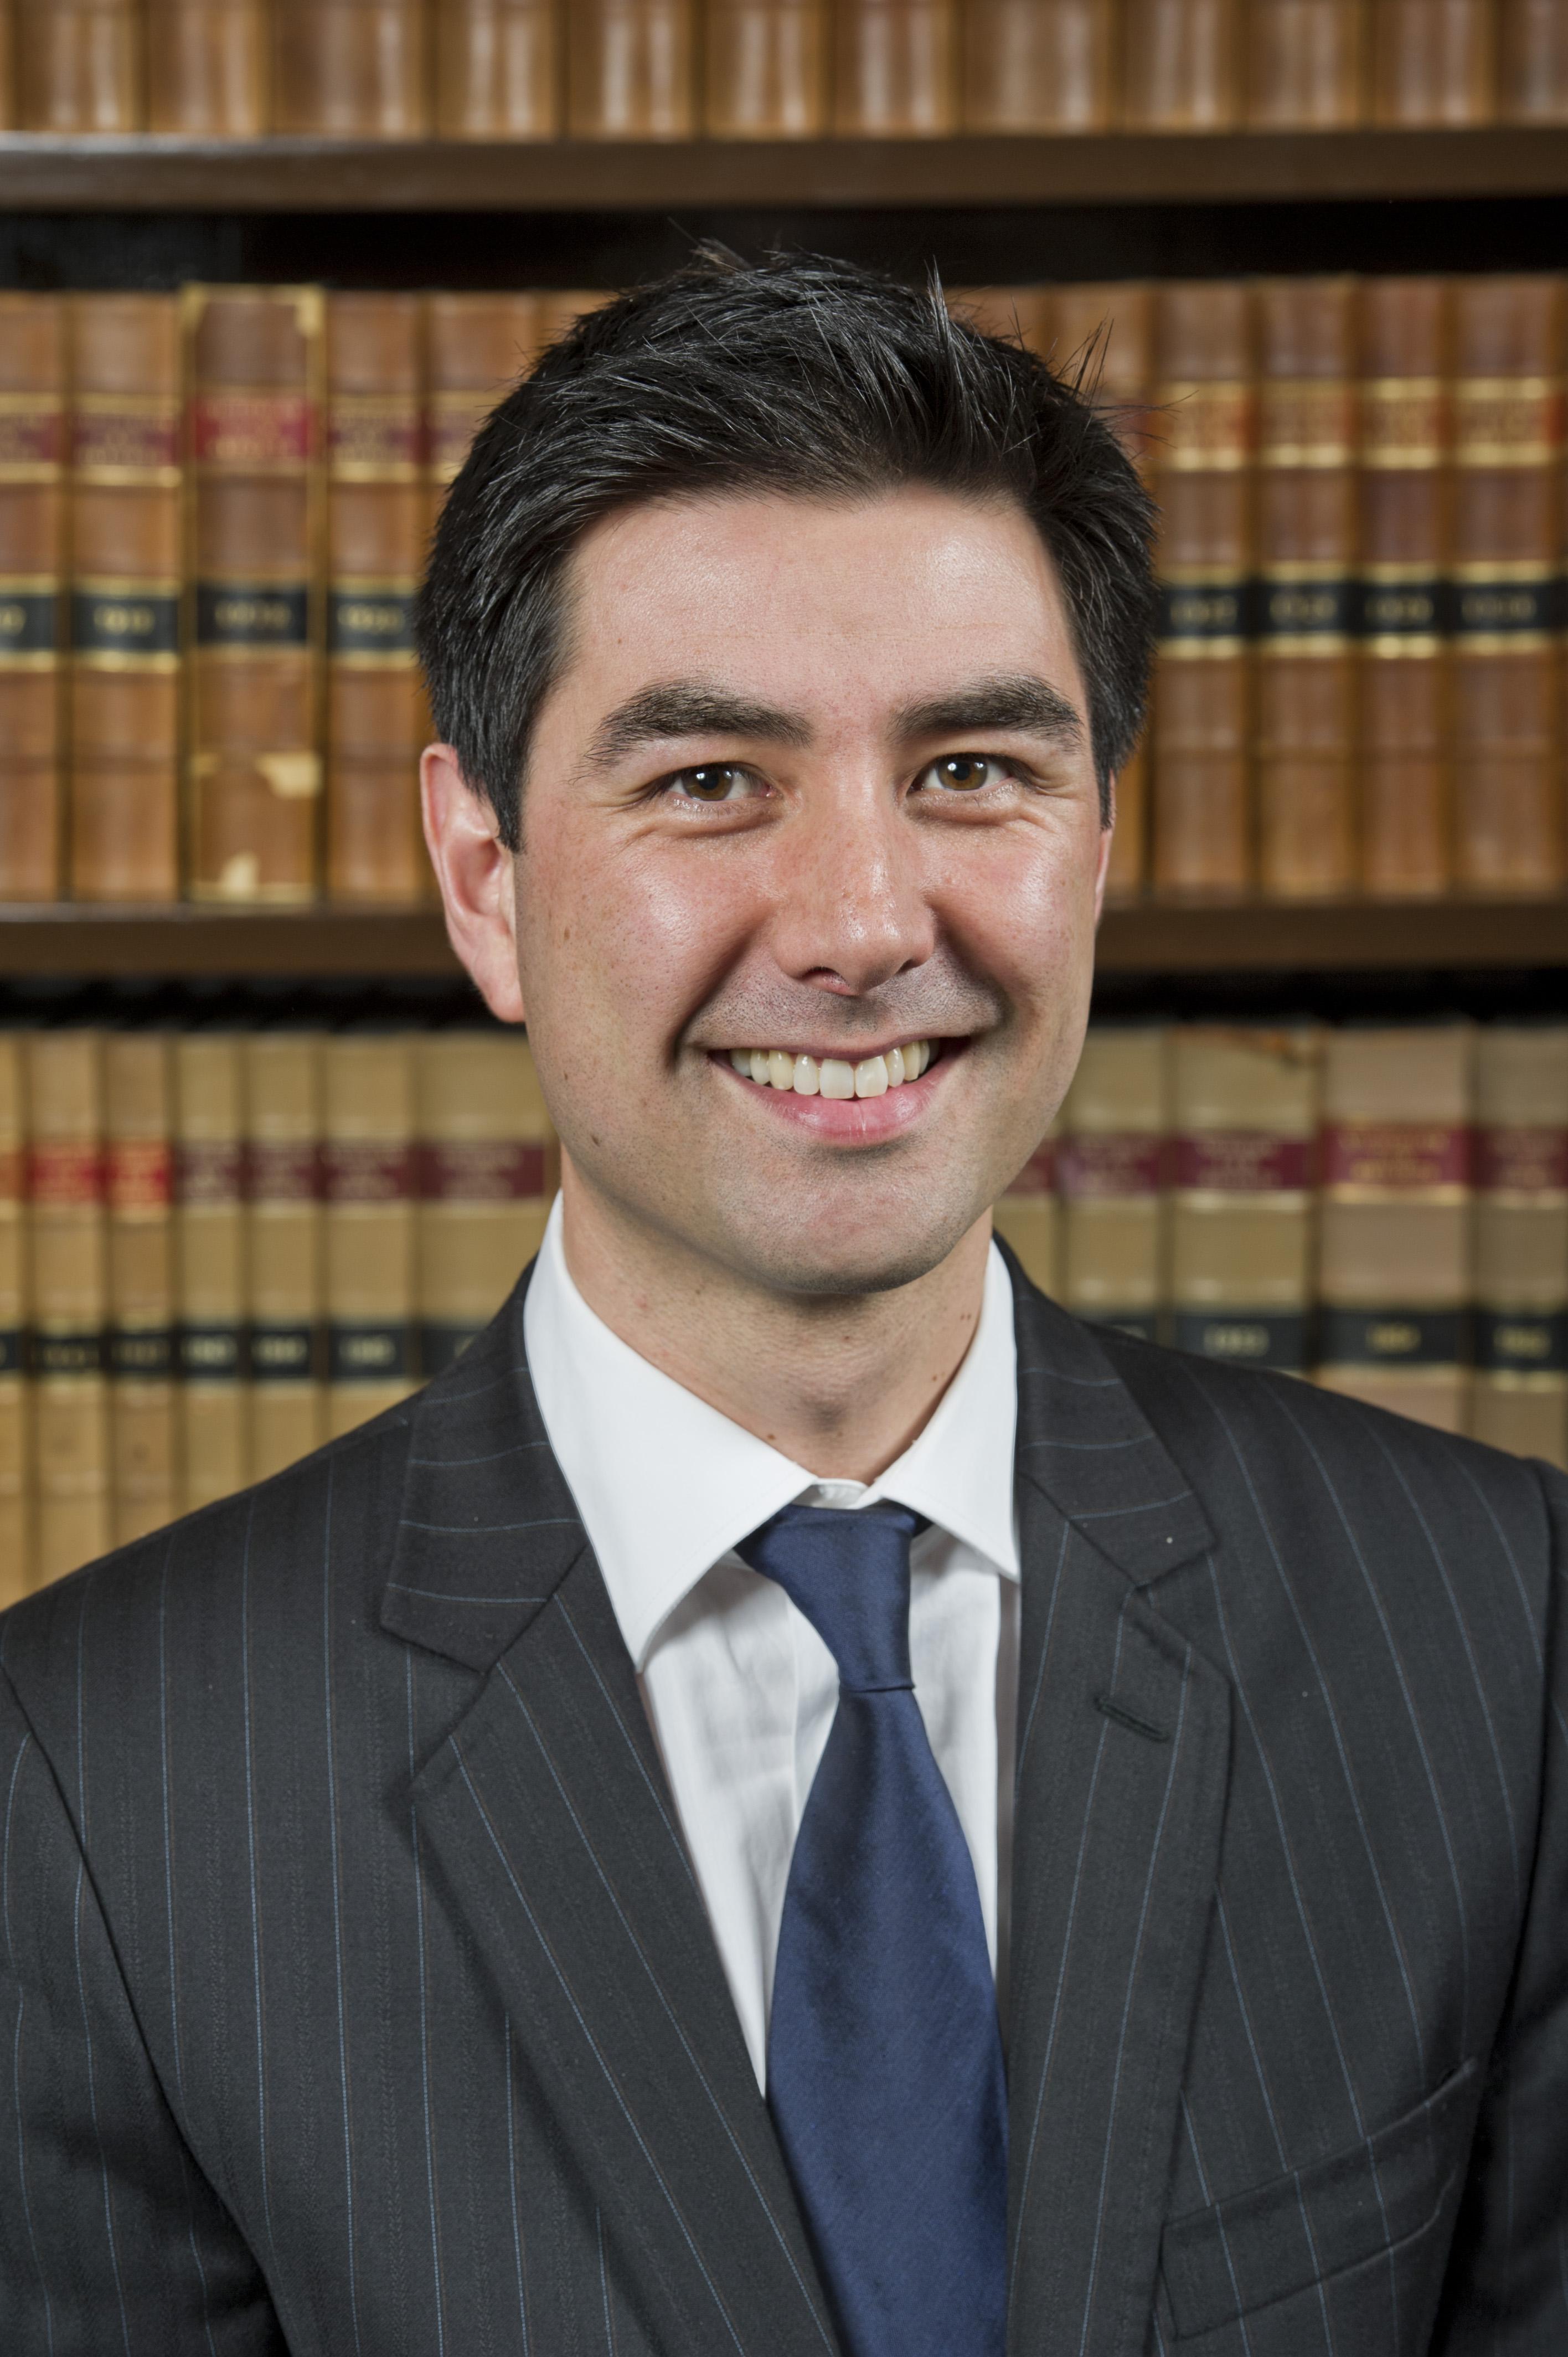 Jonathan Wilkinson, BA LLB JD